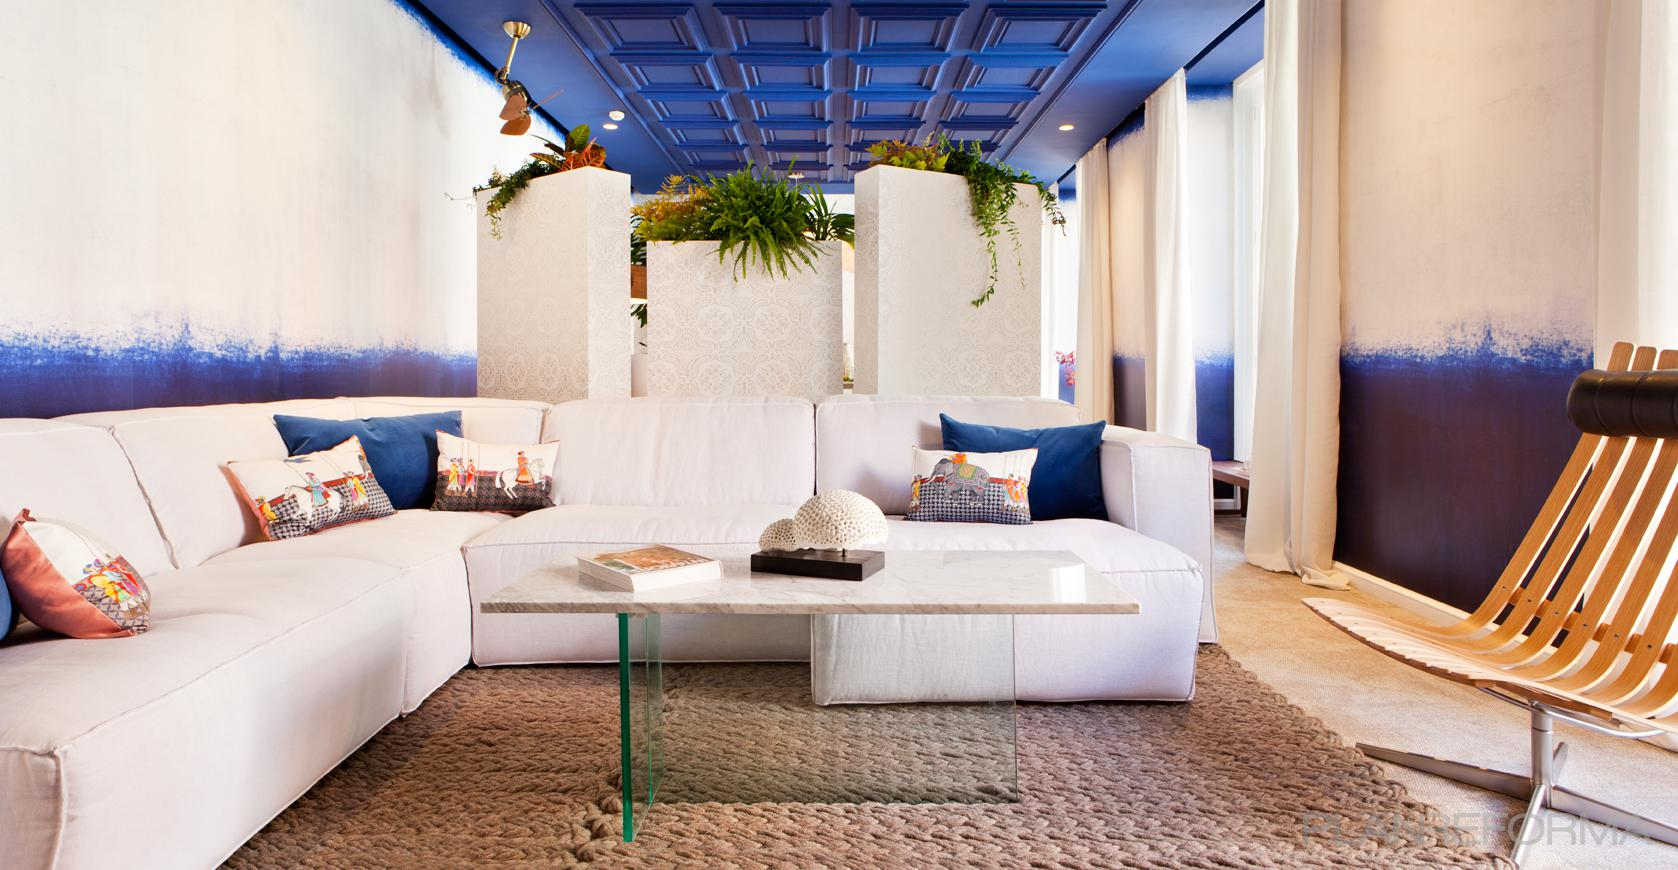 Salon estilo mediterraneo azul azul oscuro blanco - Estilos de interiorismo ...